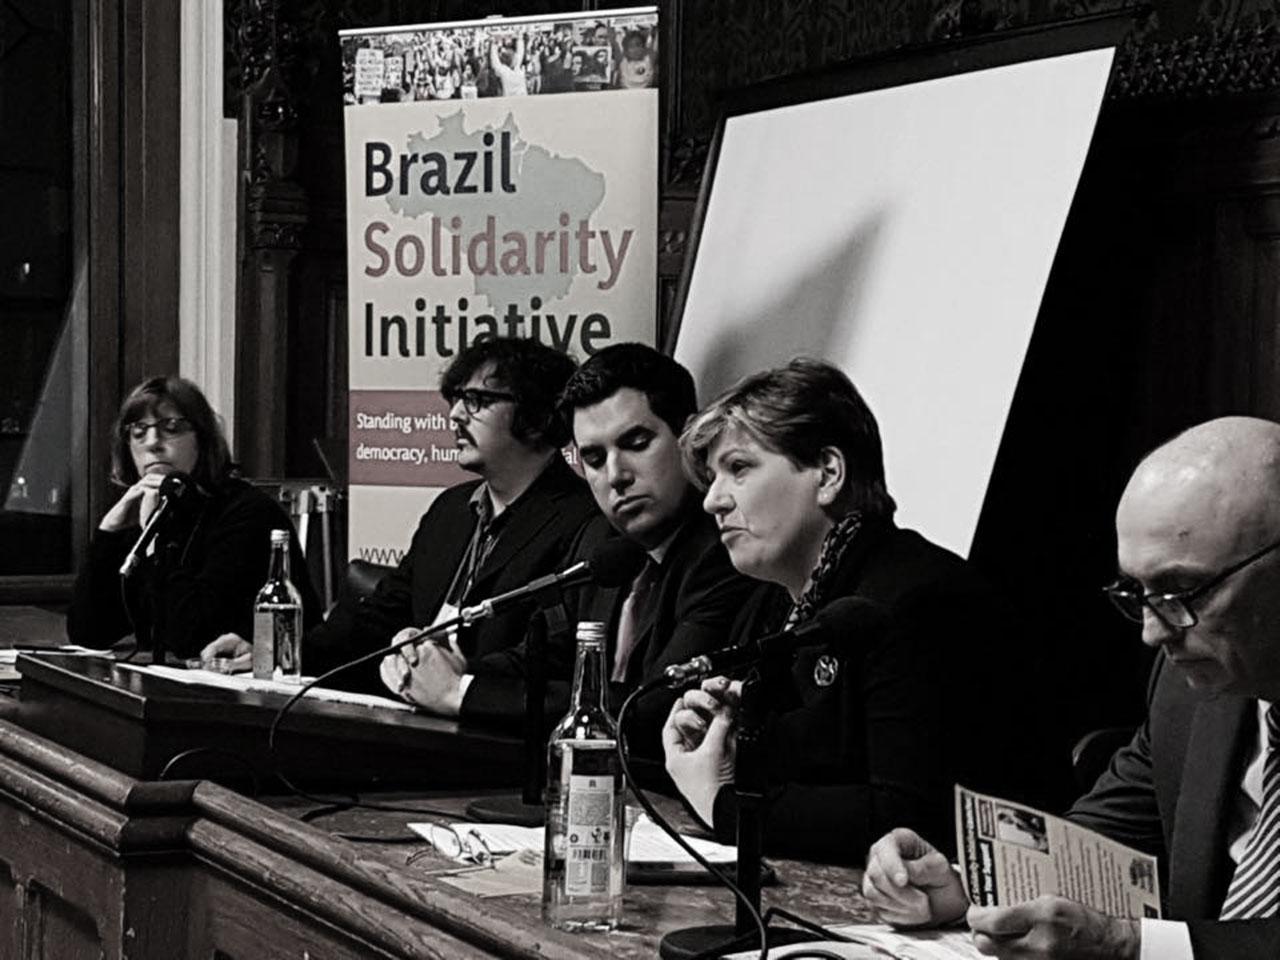 Brazil Solidarity Initiative: Editor Speaks At UK Parliament